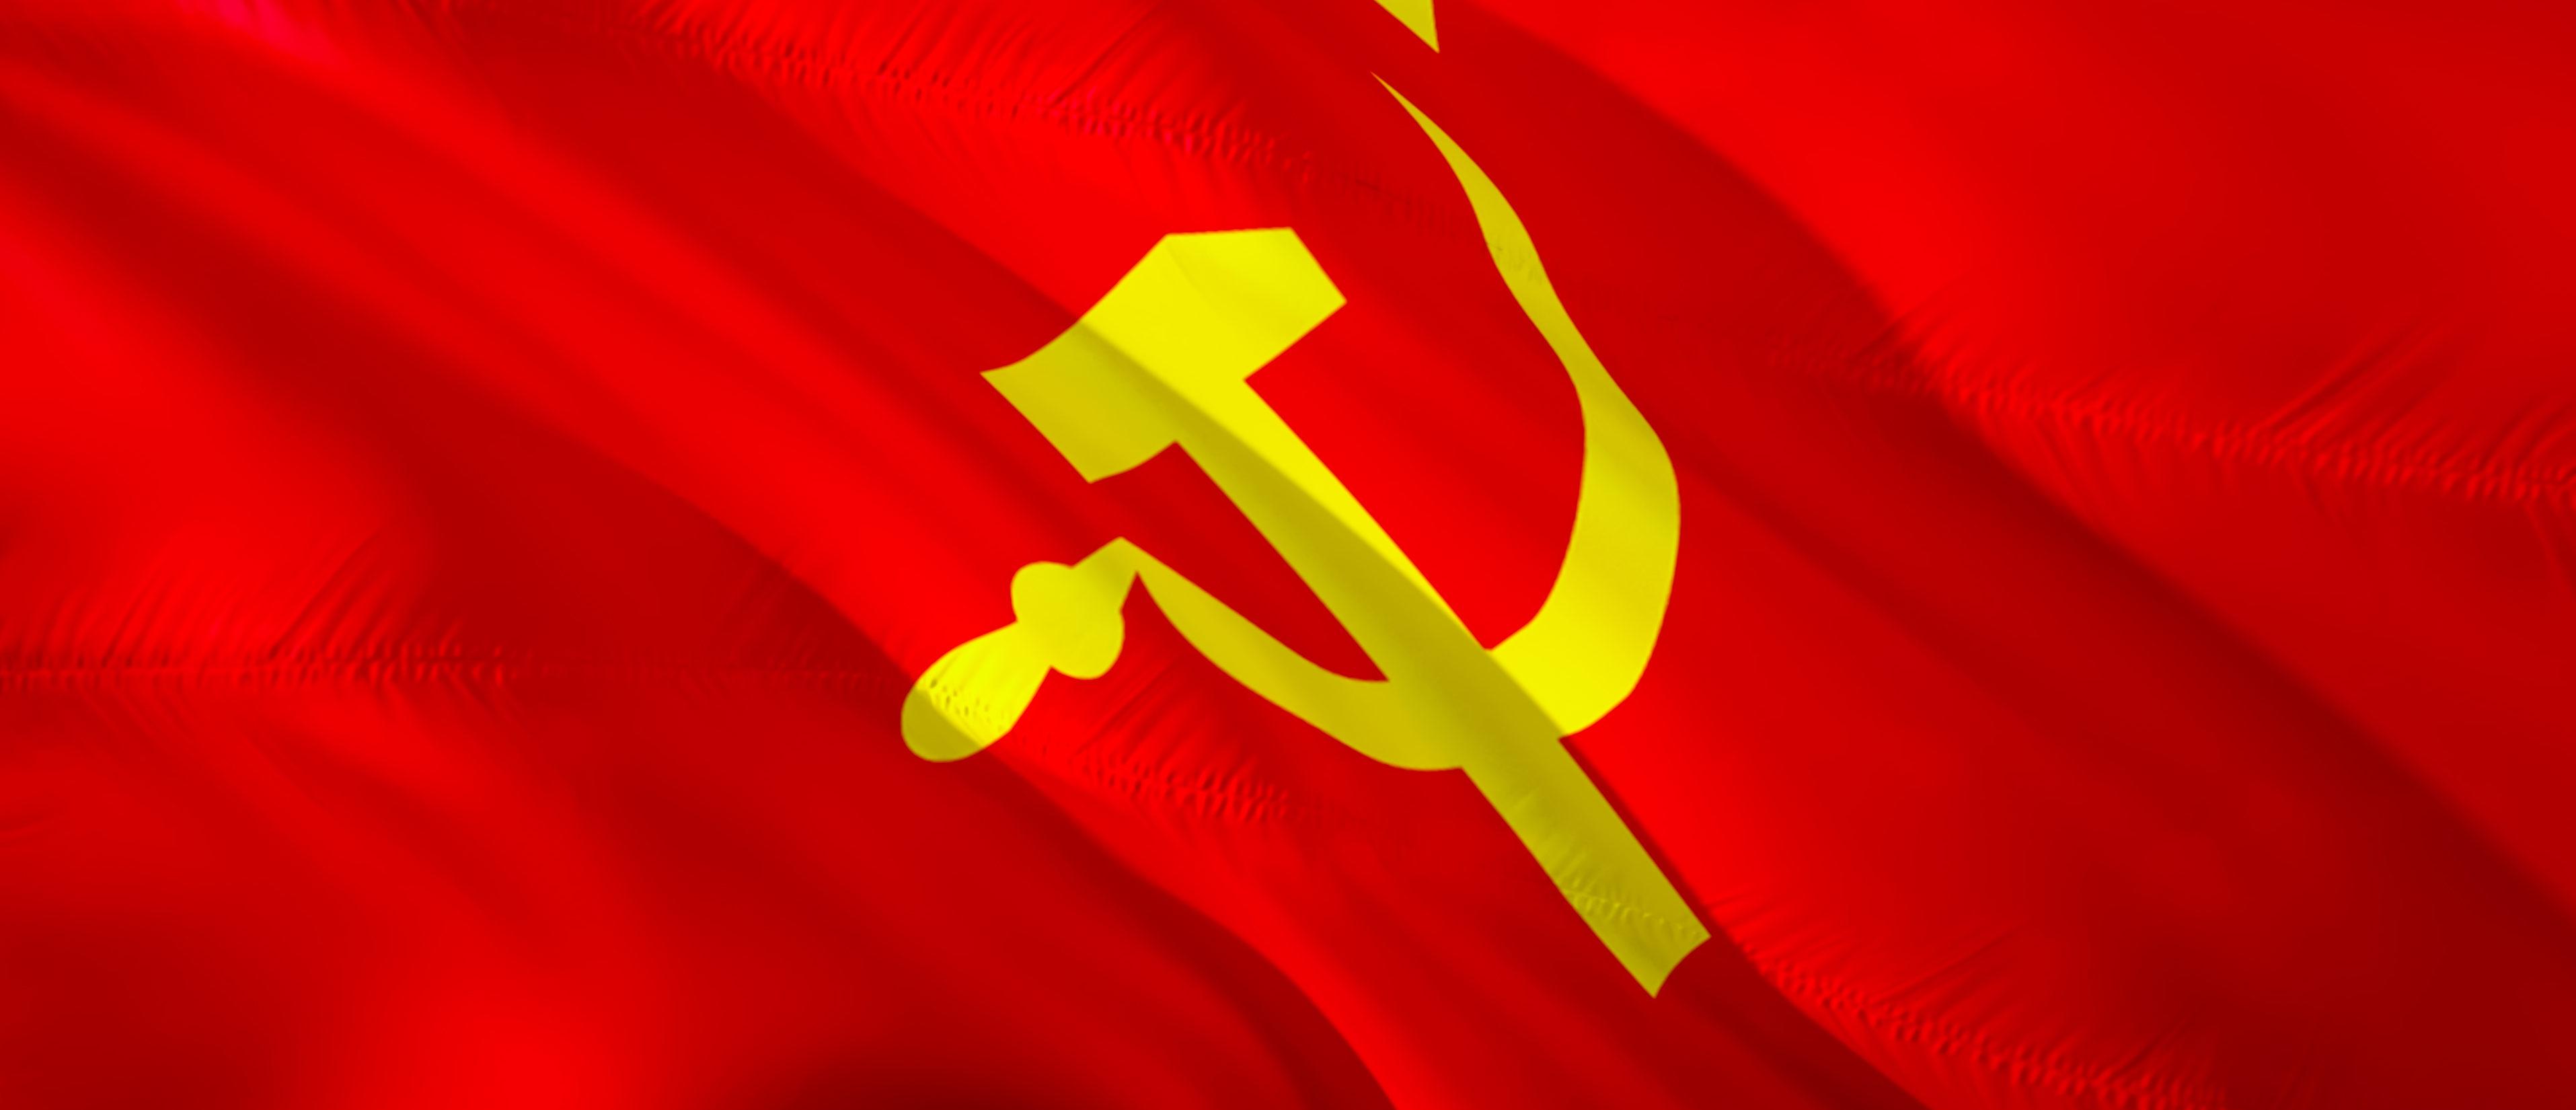 shutterstock communism